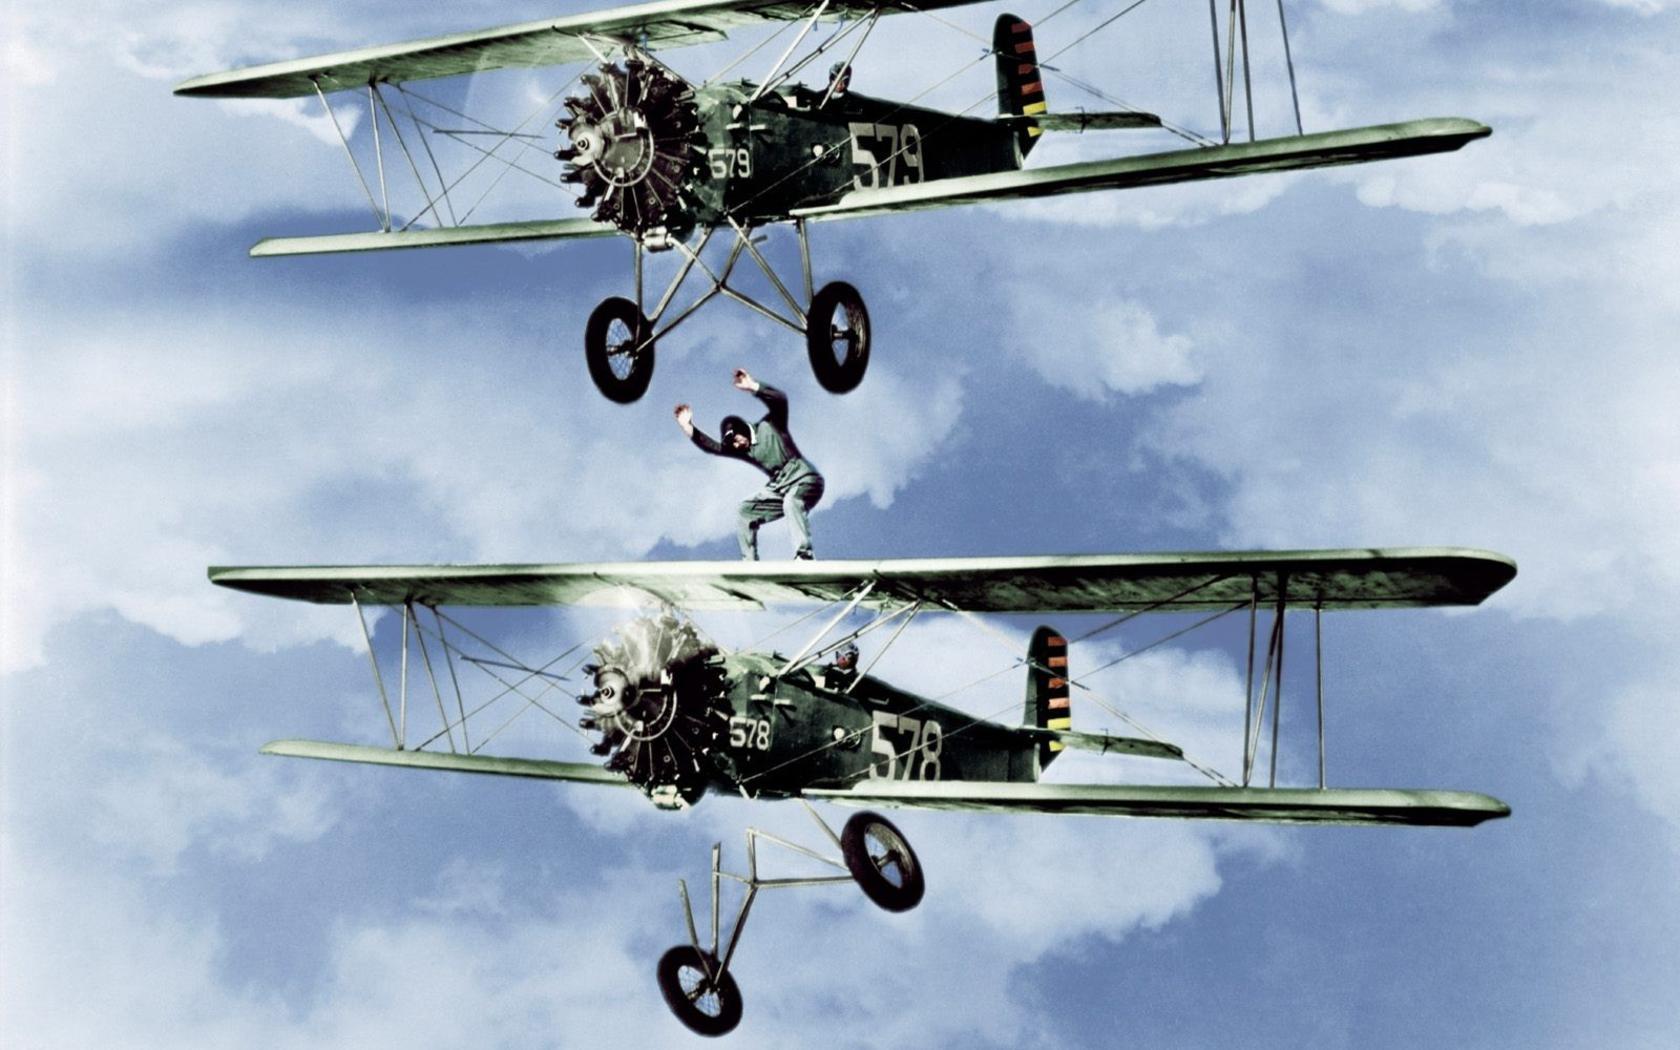 biplane daredevils widescreen wallpaper 73526